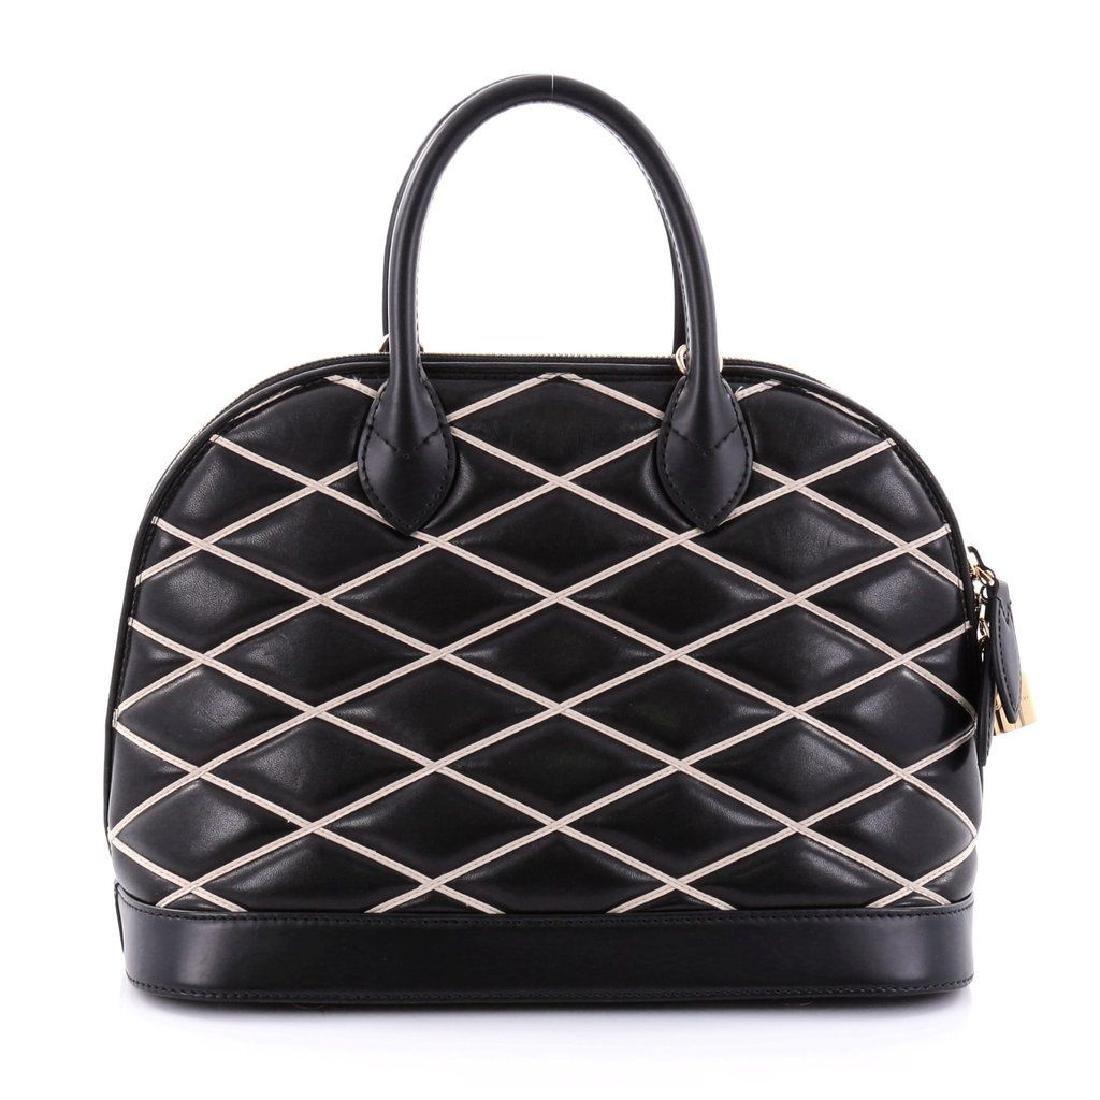 Limited Edition Louis Vuitton Black Diamond Alma PM - 3